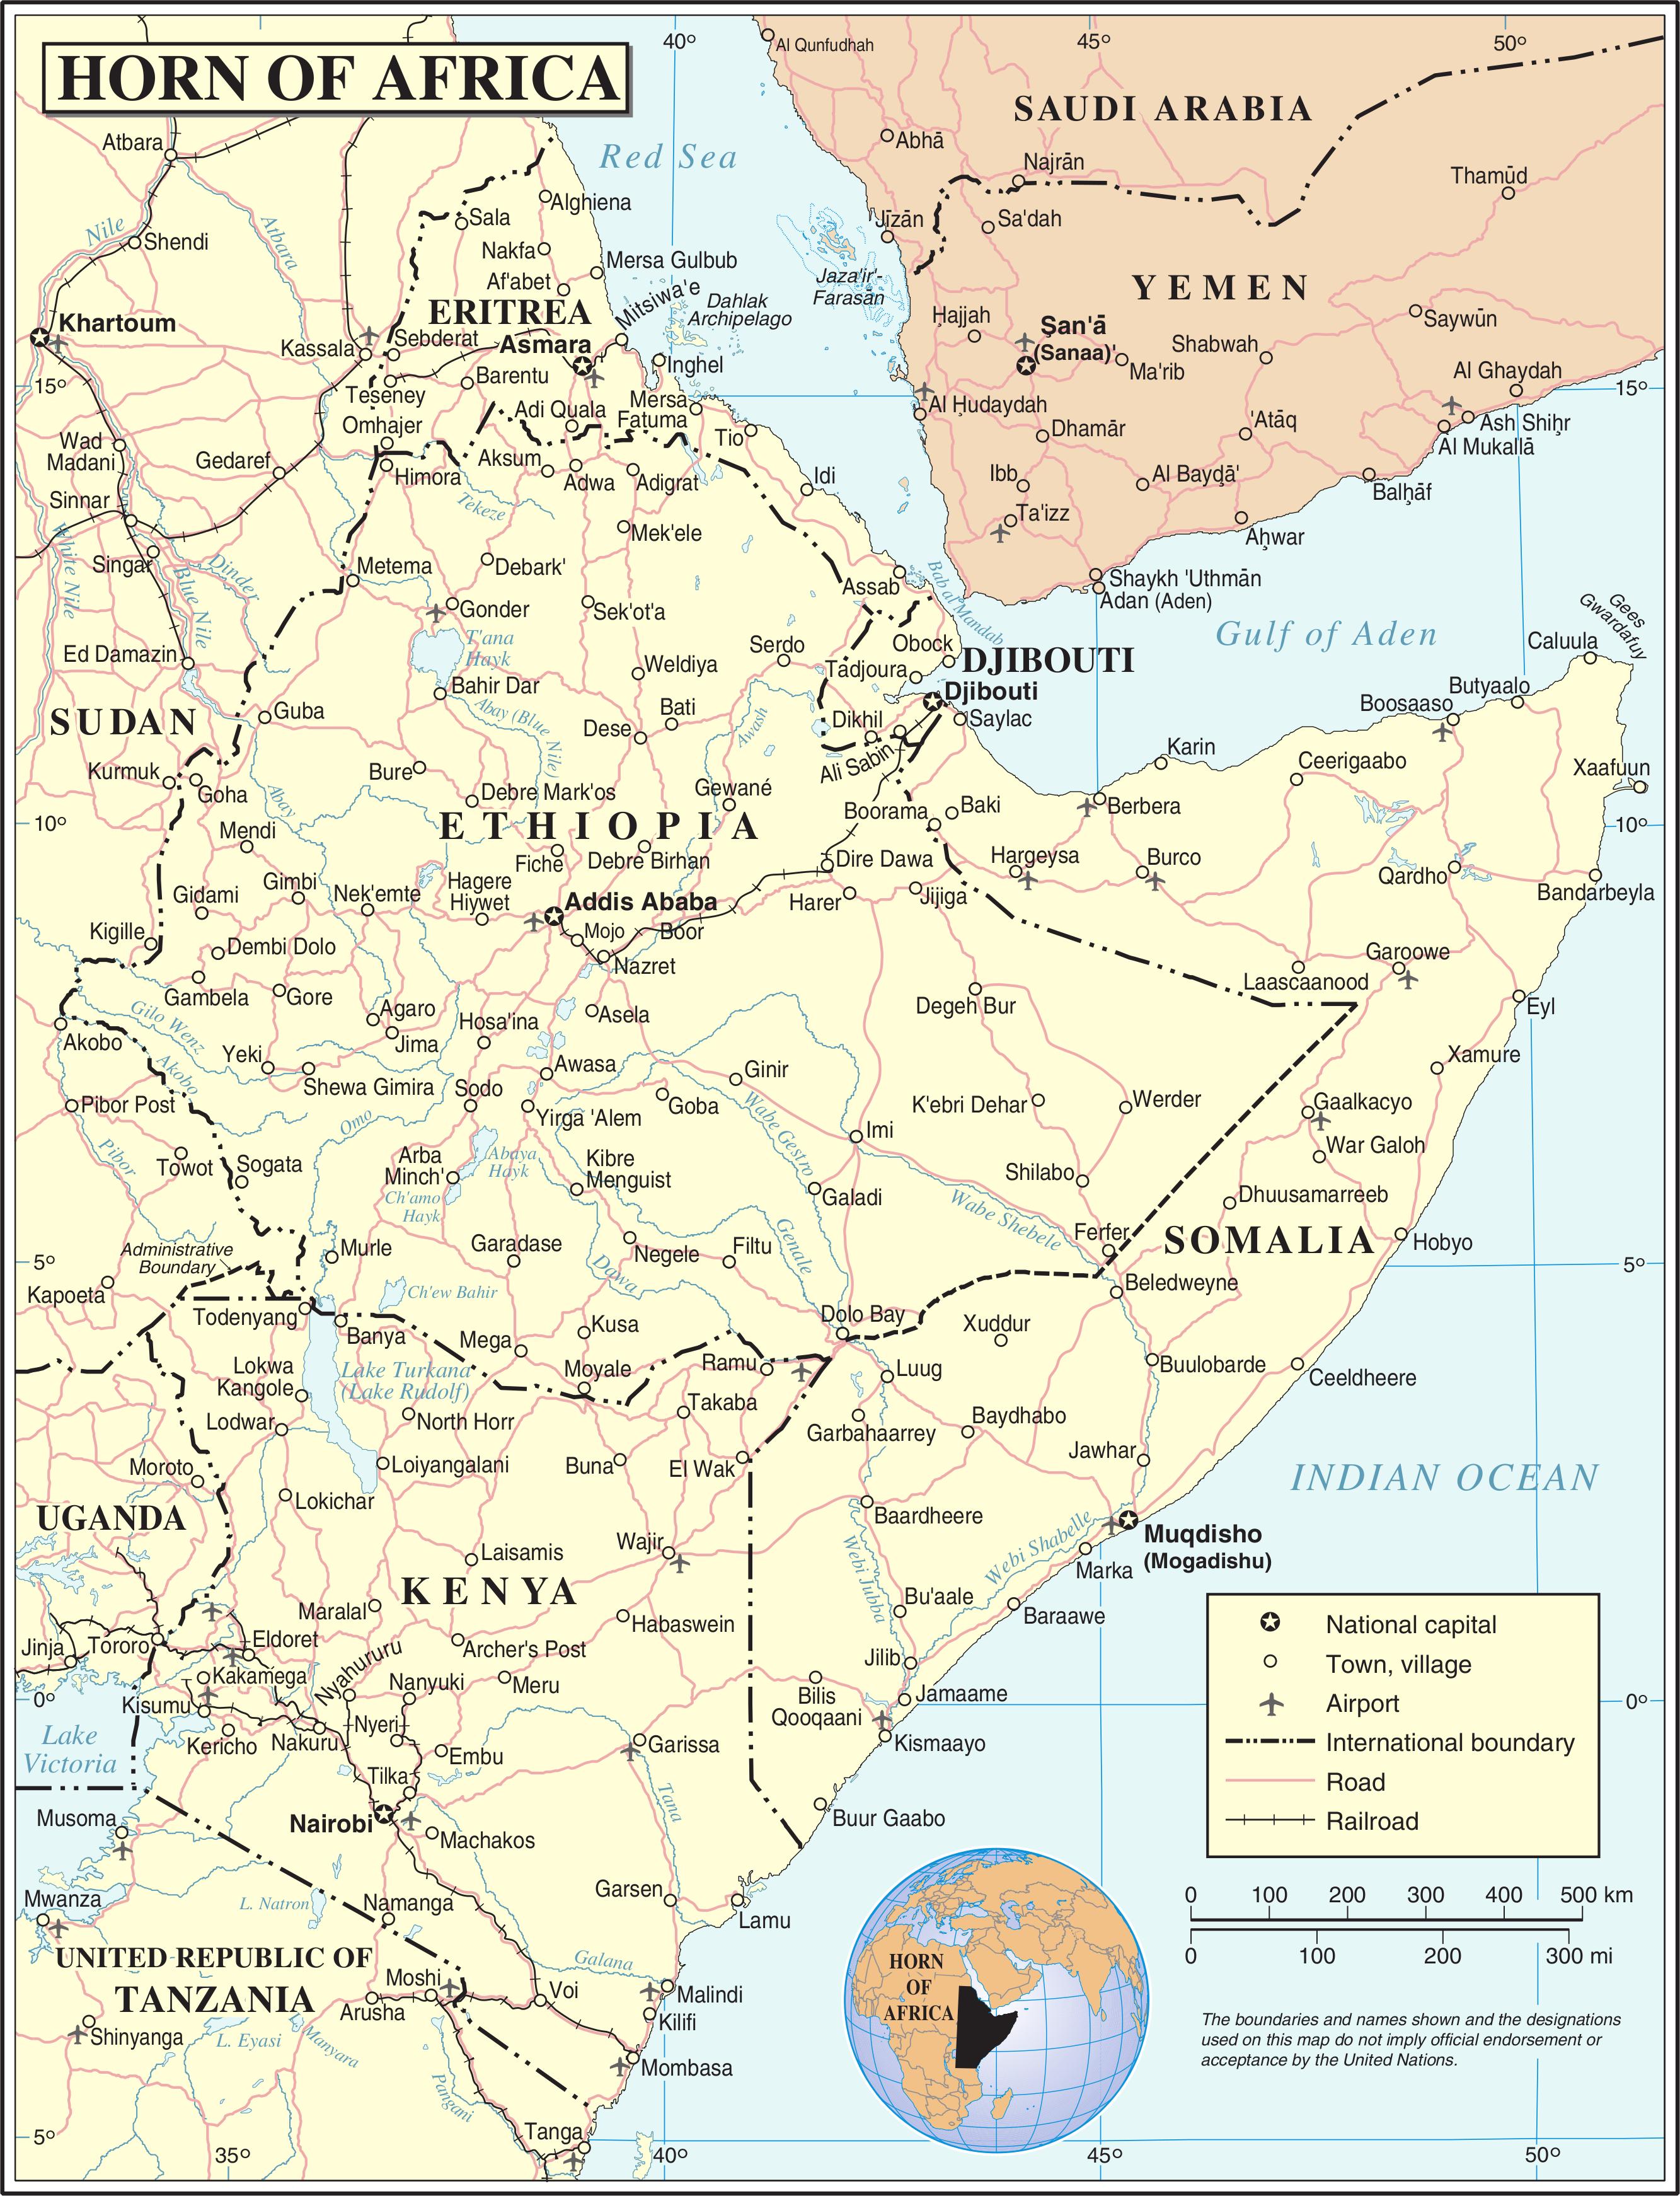 FileUnhornofafricapng Wikimedia Commons - Horn of africa map